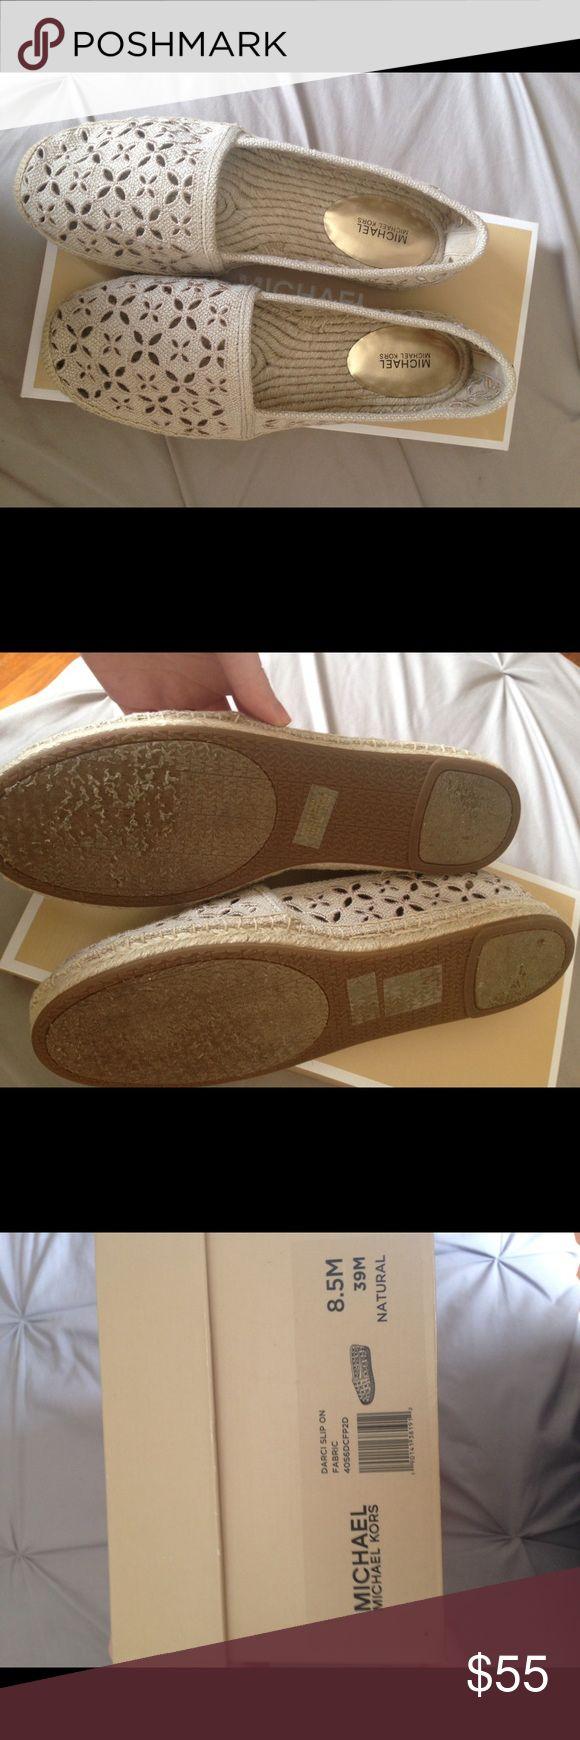 Michael Kors espadrilles Only worn a few times! Nude espadrilles! MICHAEL Michael Kors Shoes Espadrilles